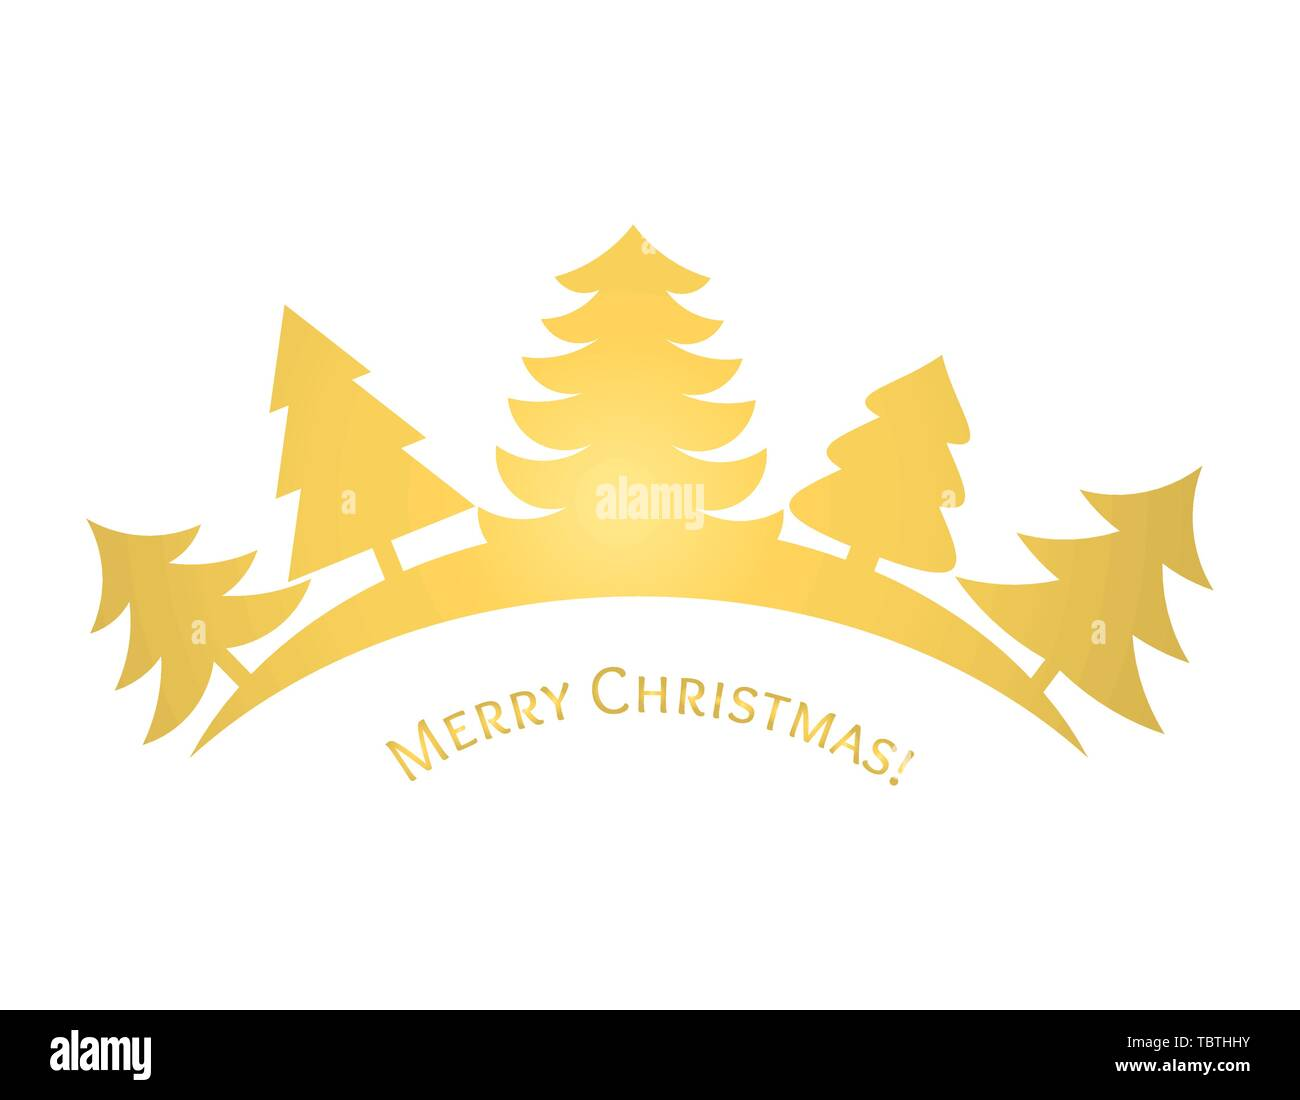 Golden Christmas trees. Vector illustration - Stock Image